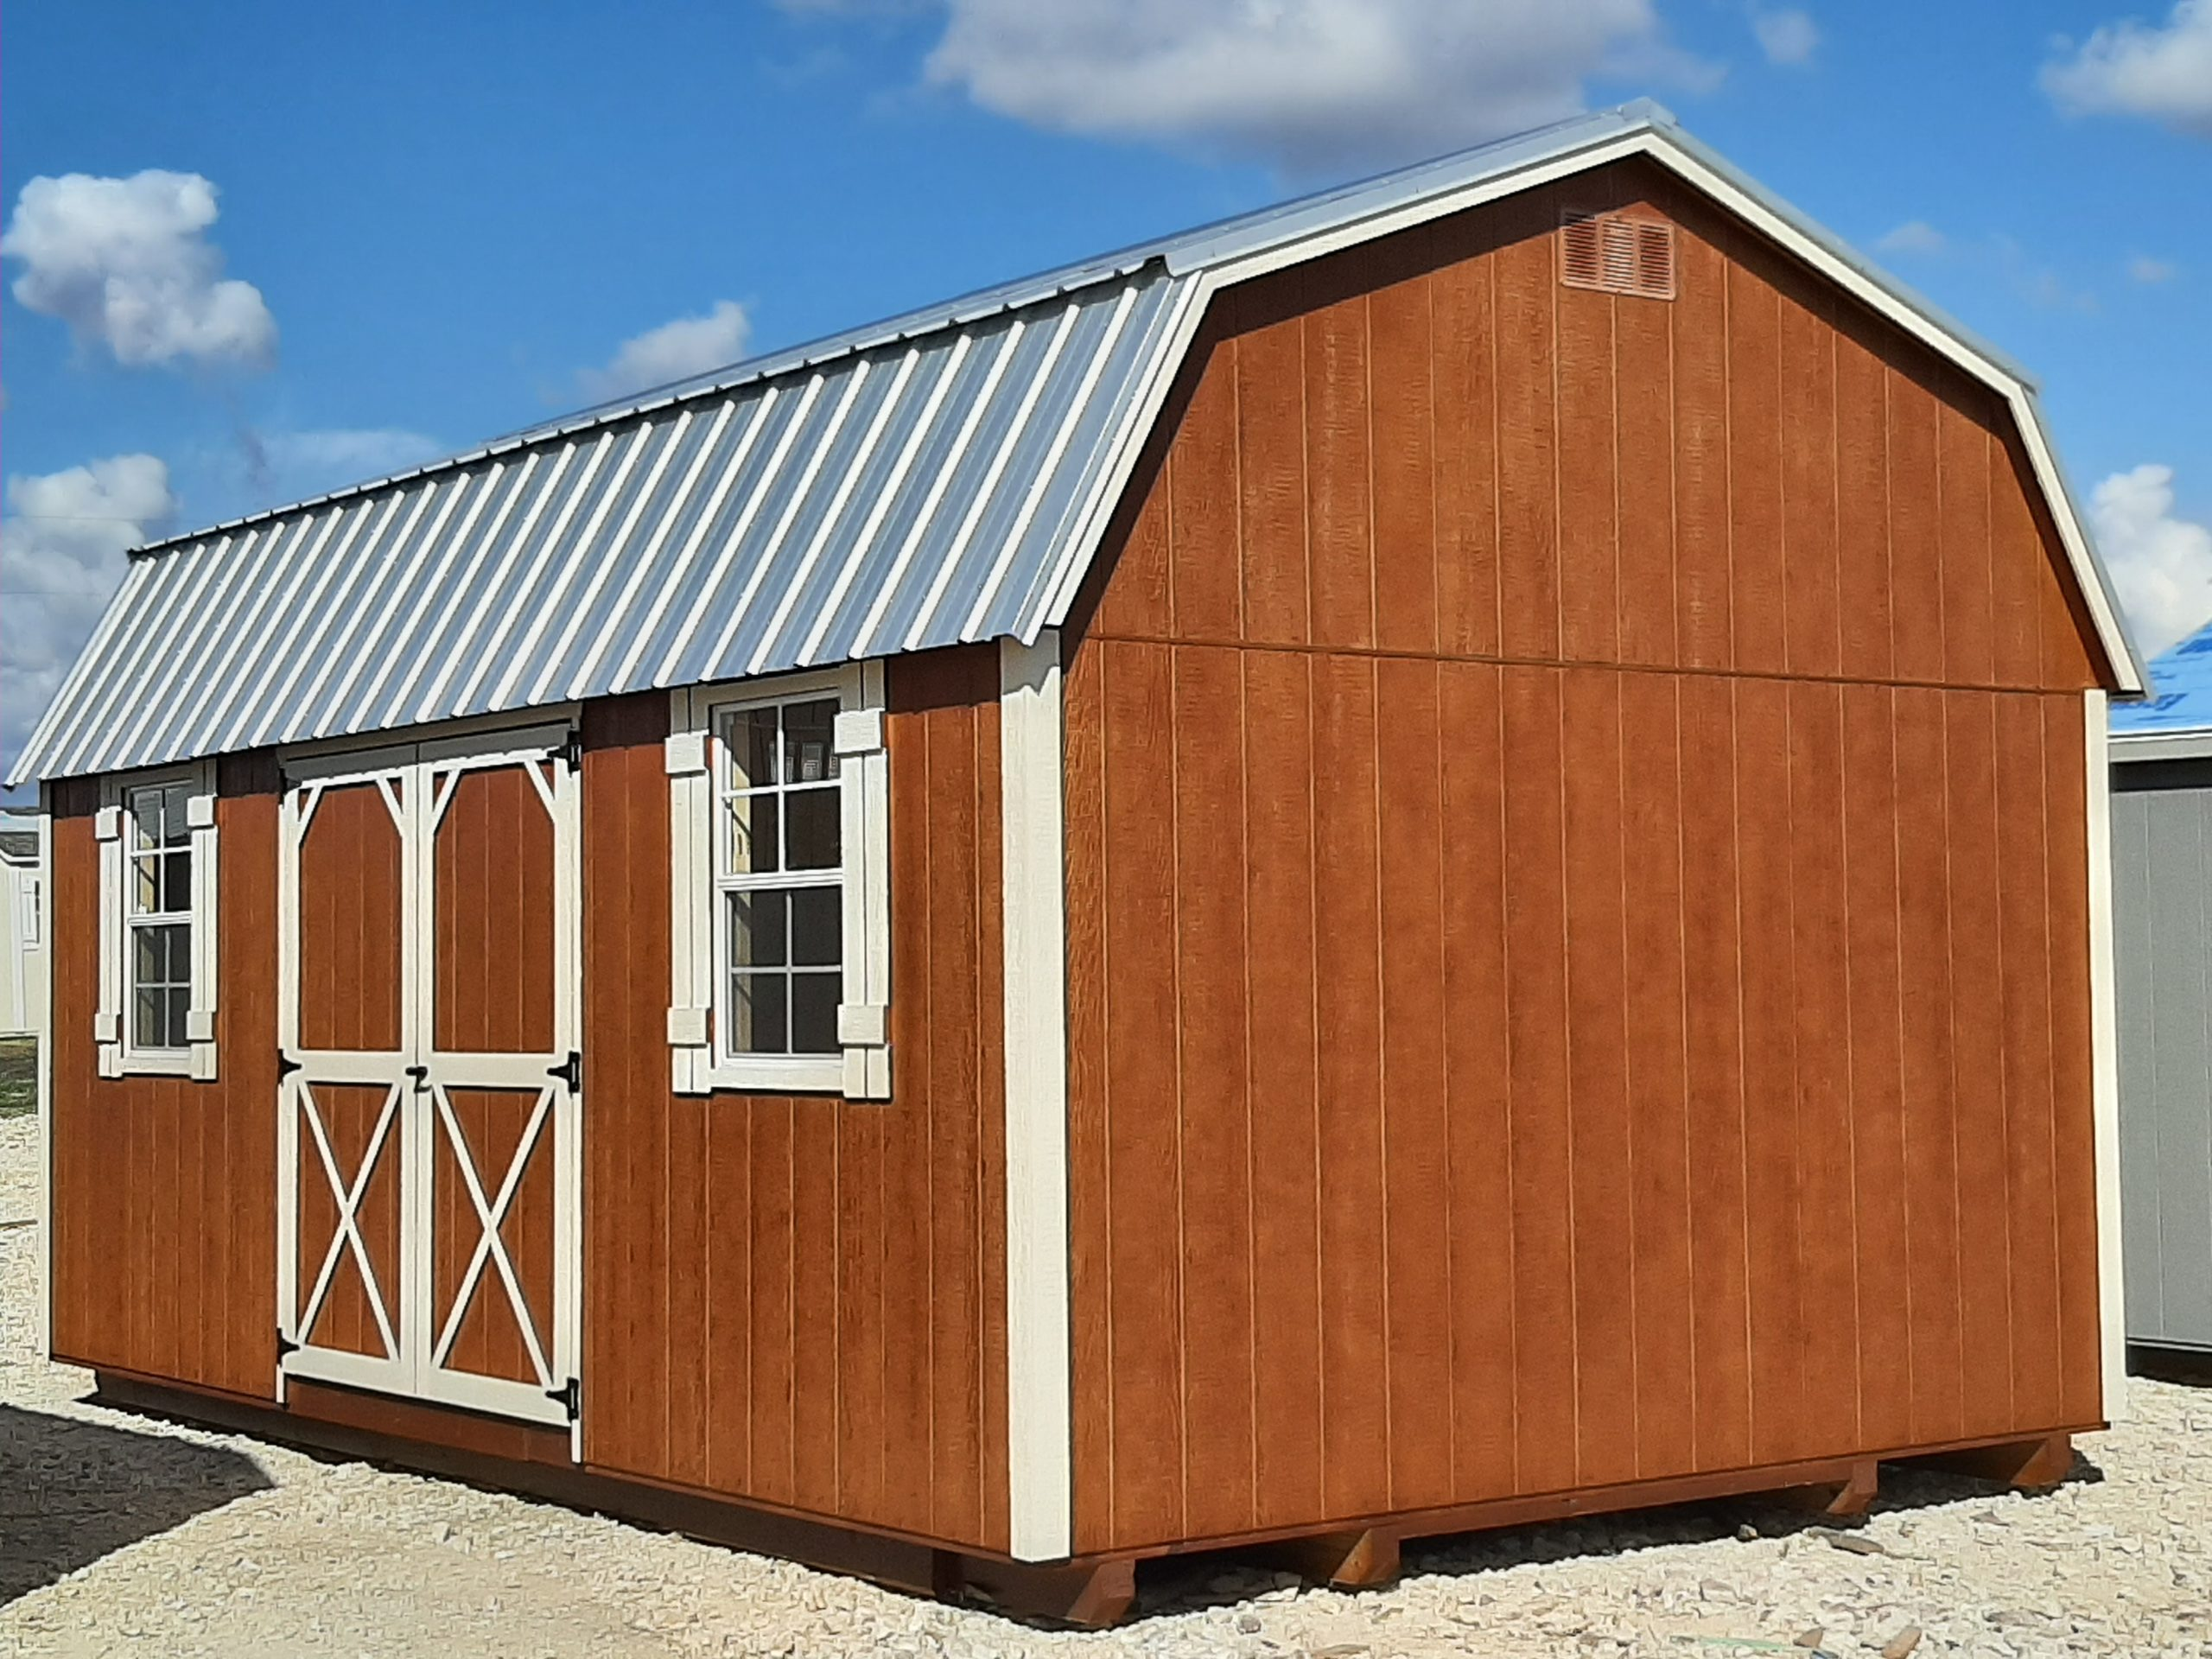 12x20 Elite Lofted Barn Image